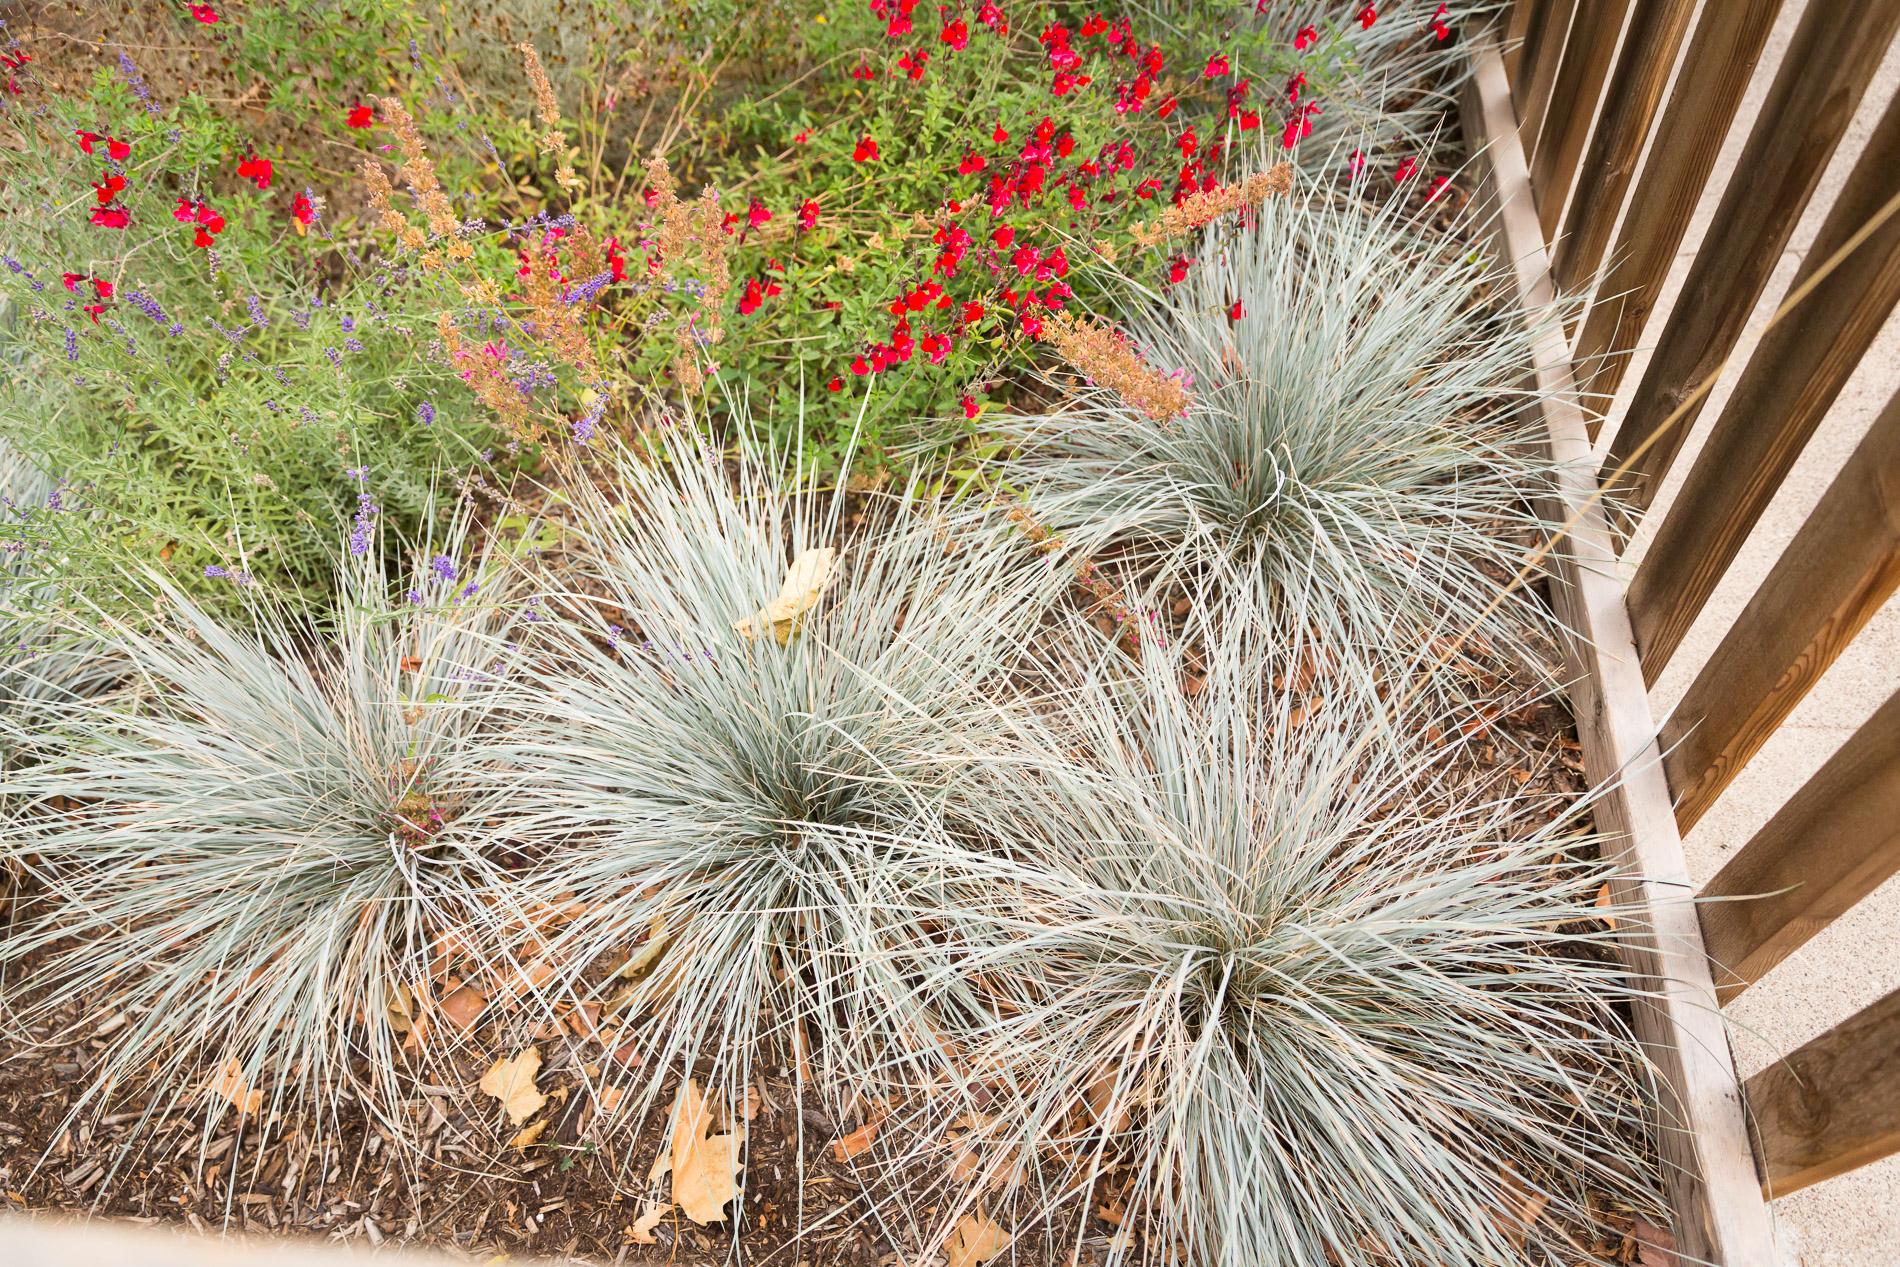 Idaho Fescue + Red Sage + Cedar Picket Fence